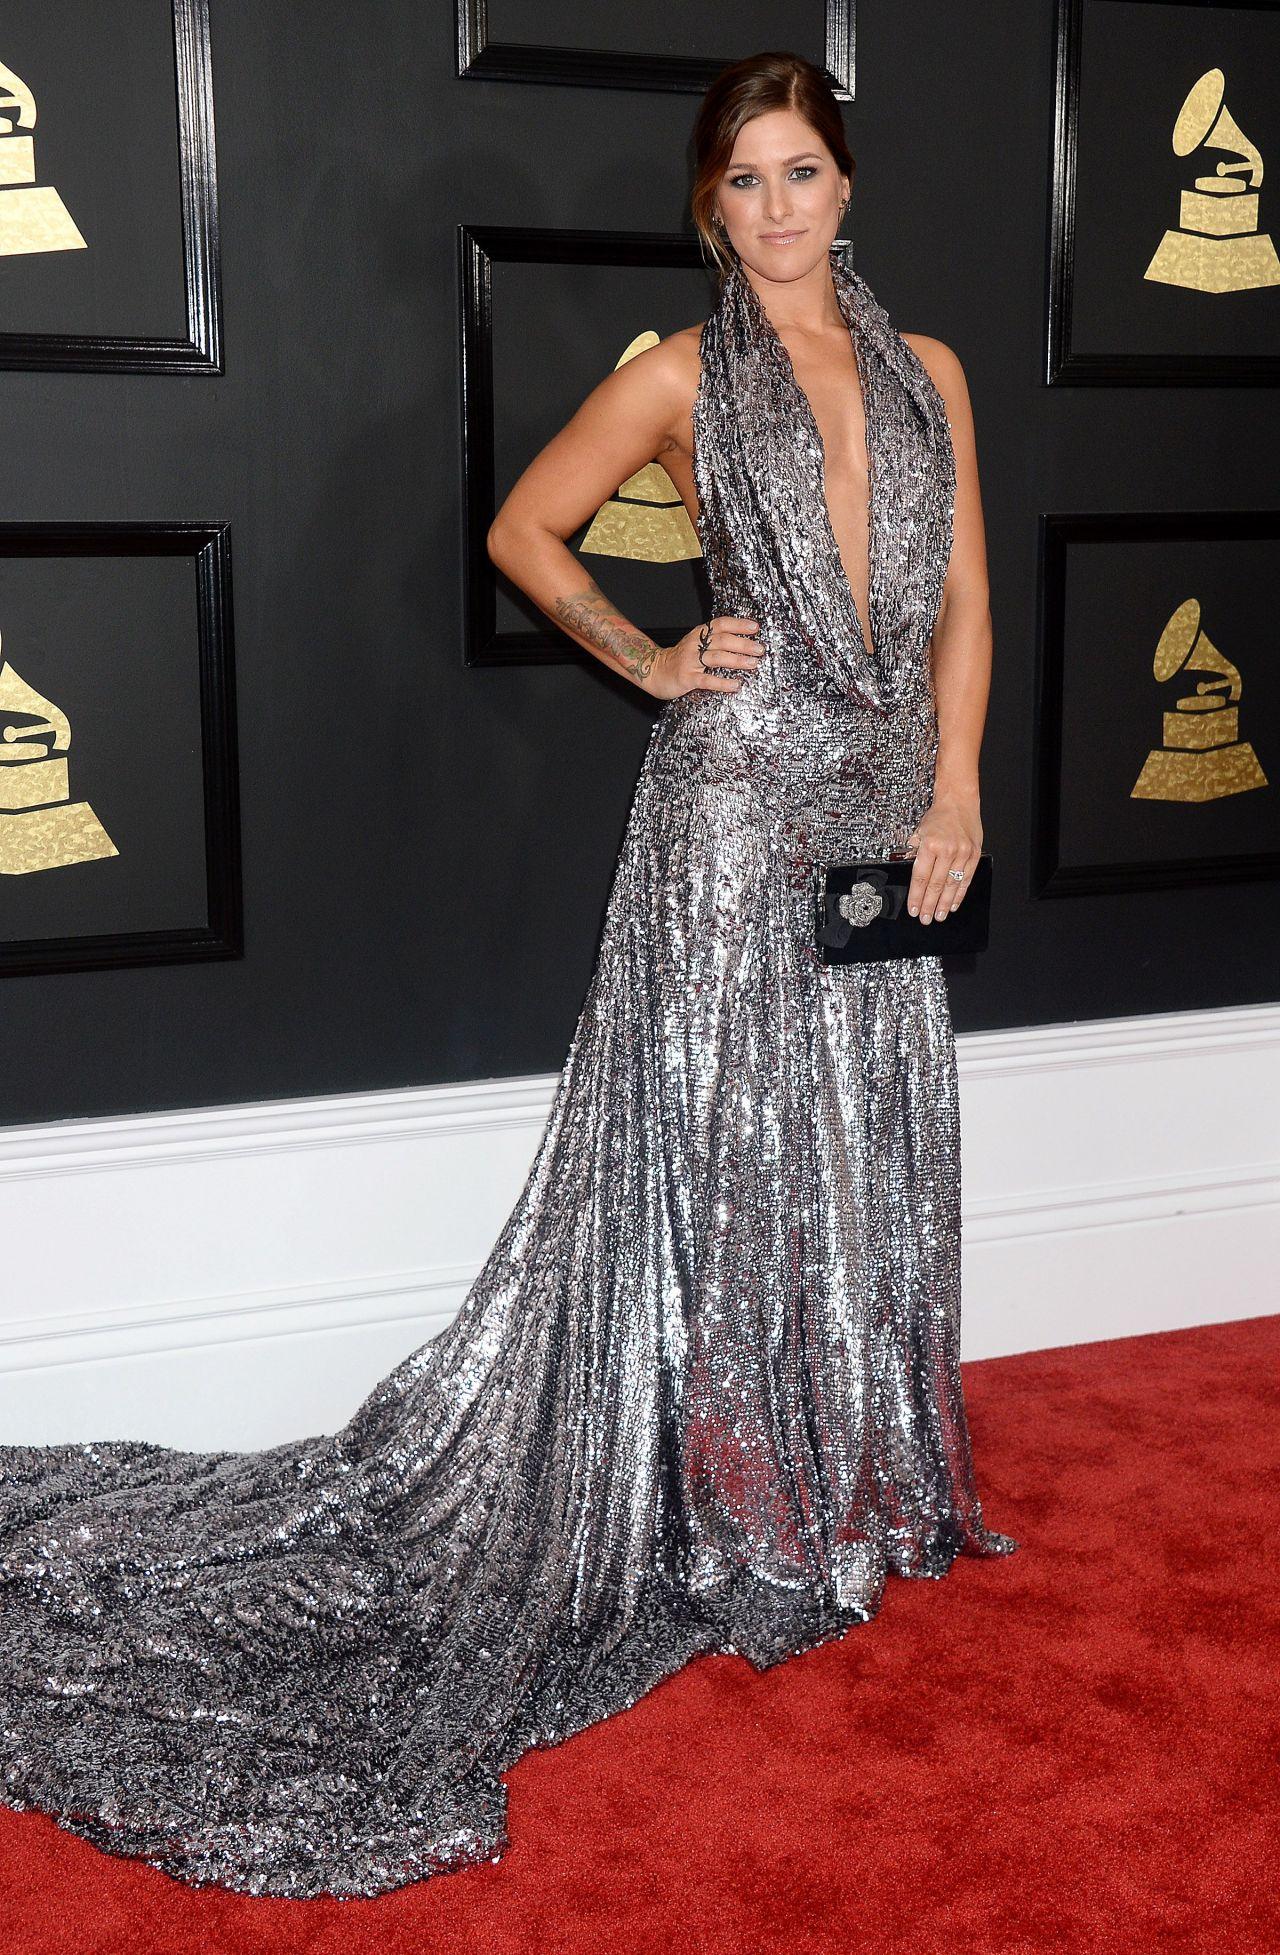 2017 Grammy Awards: Red carpet arrivals | Buro 24/7